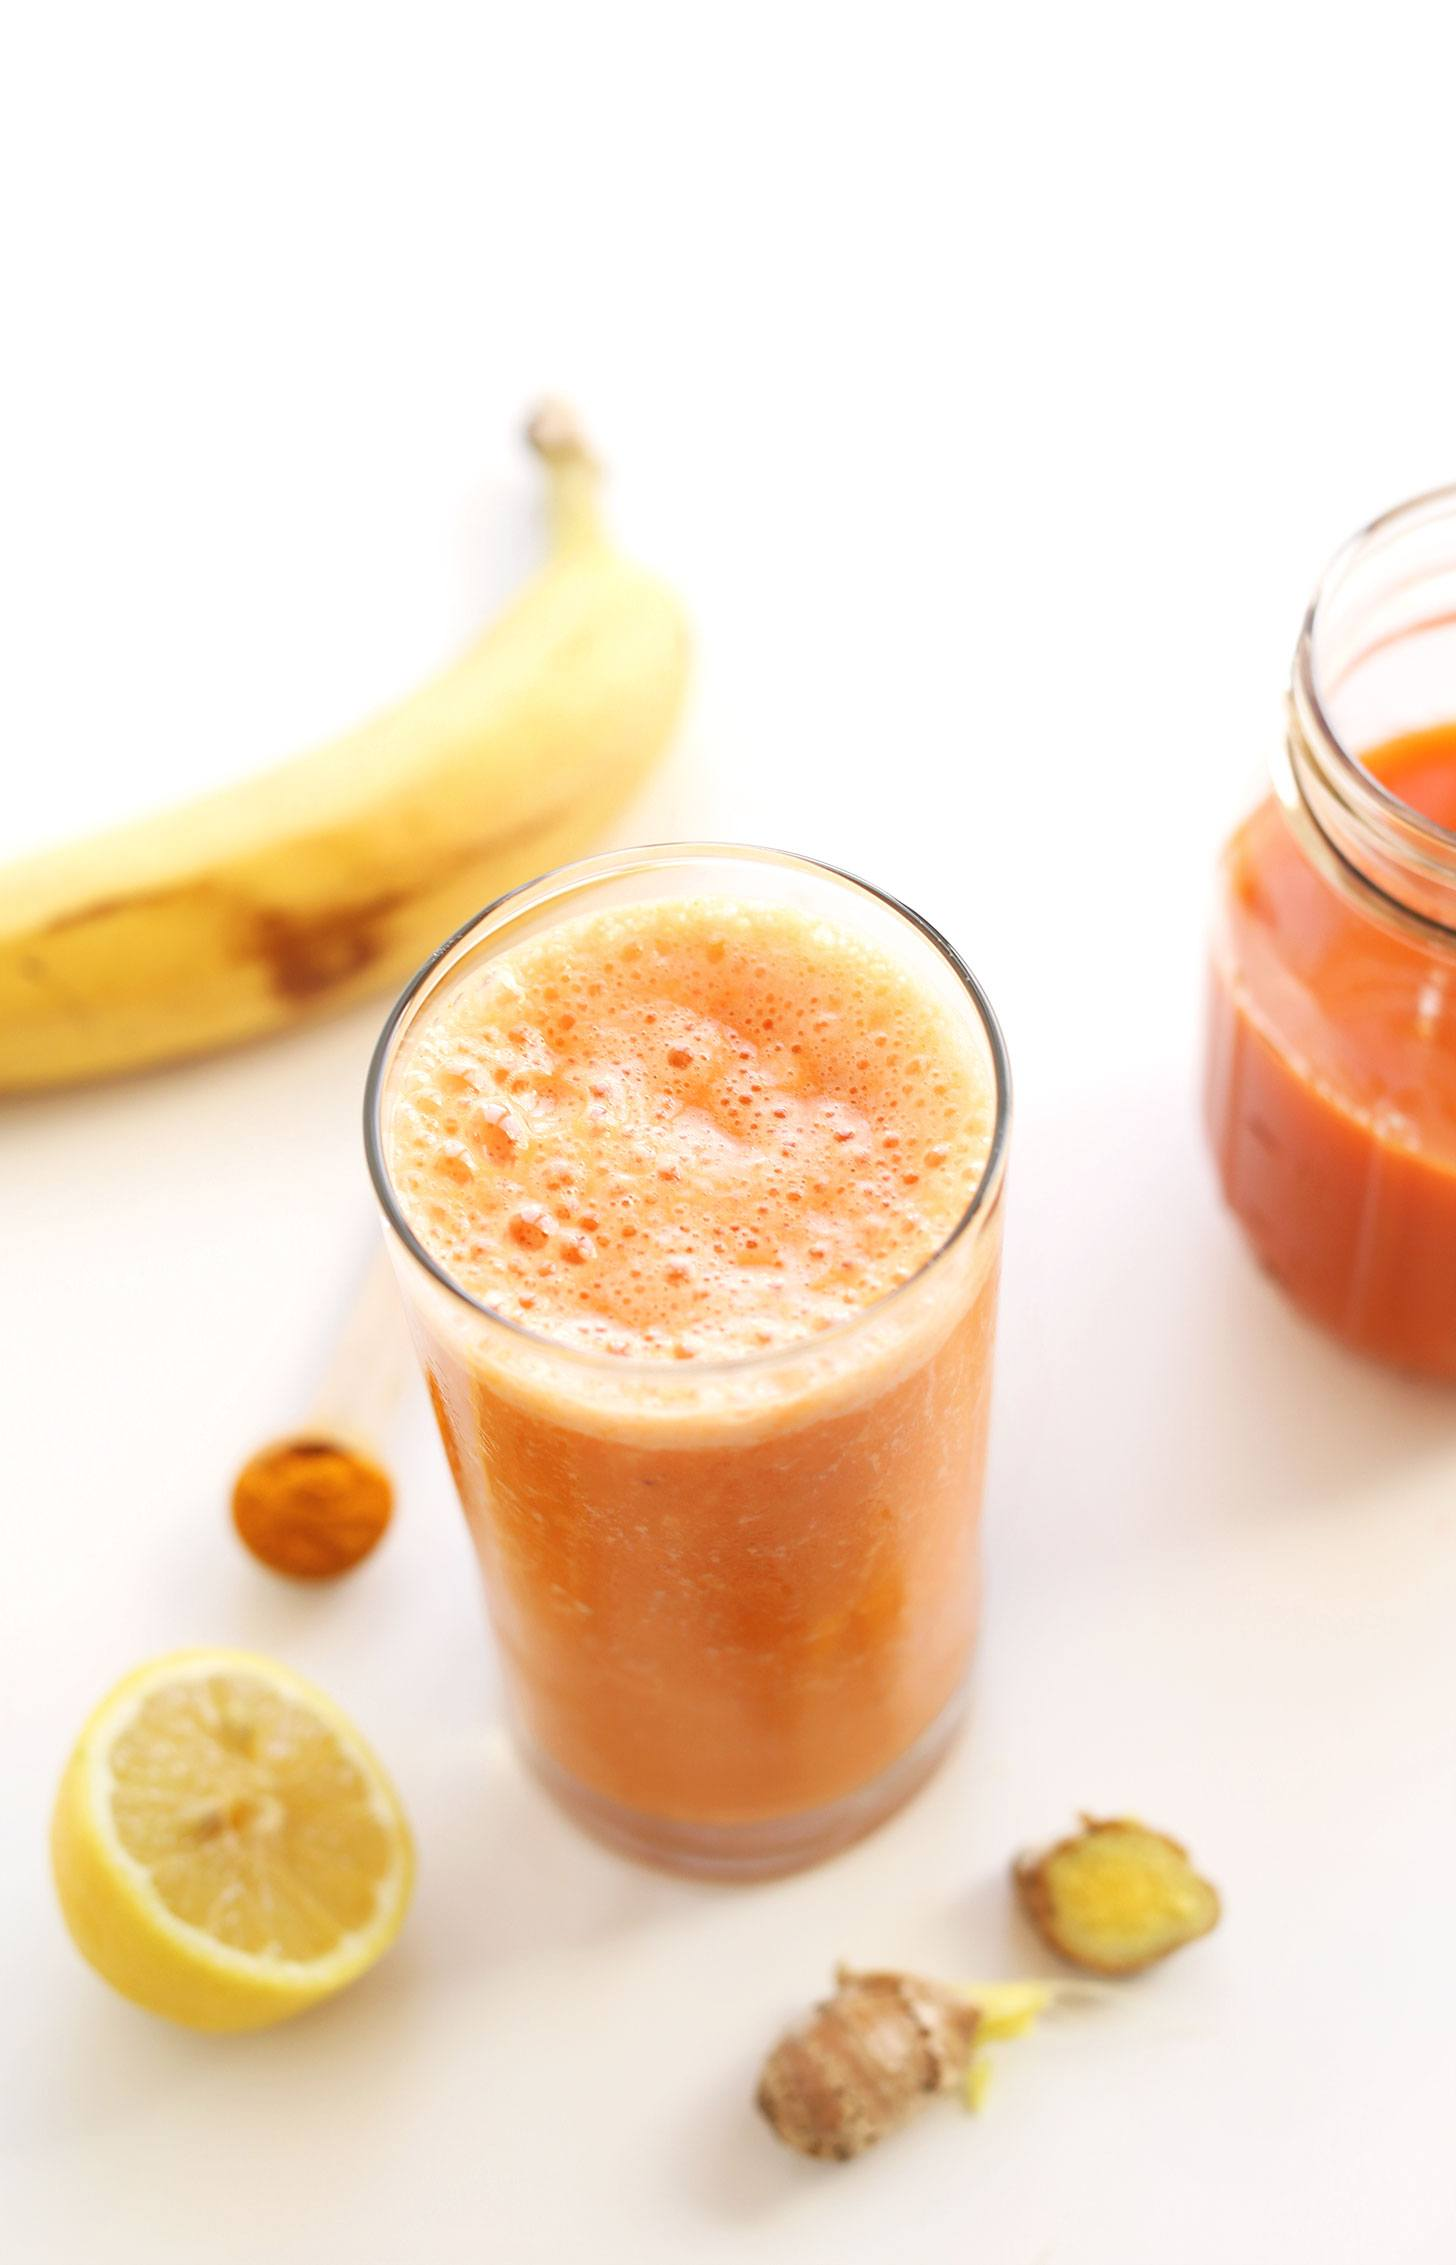 Carrot Ginger Turmeric anti inflammatory smoothie